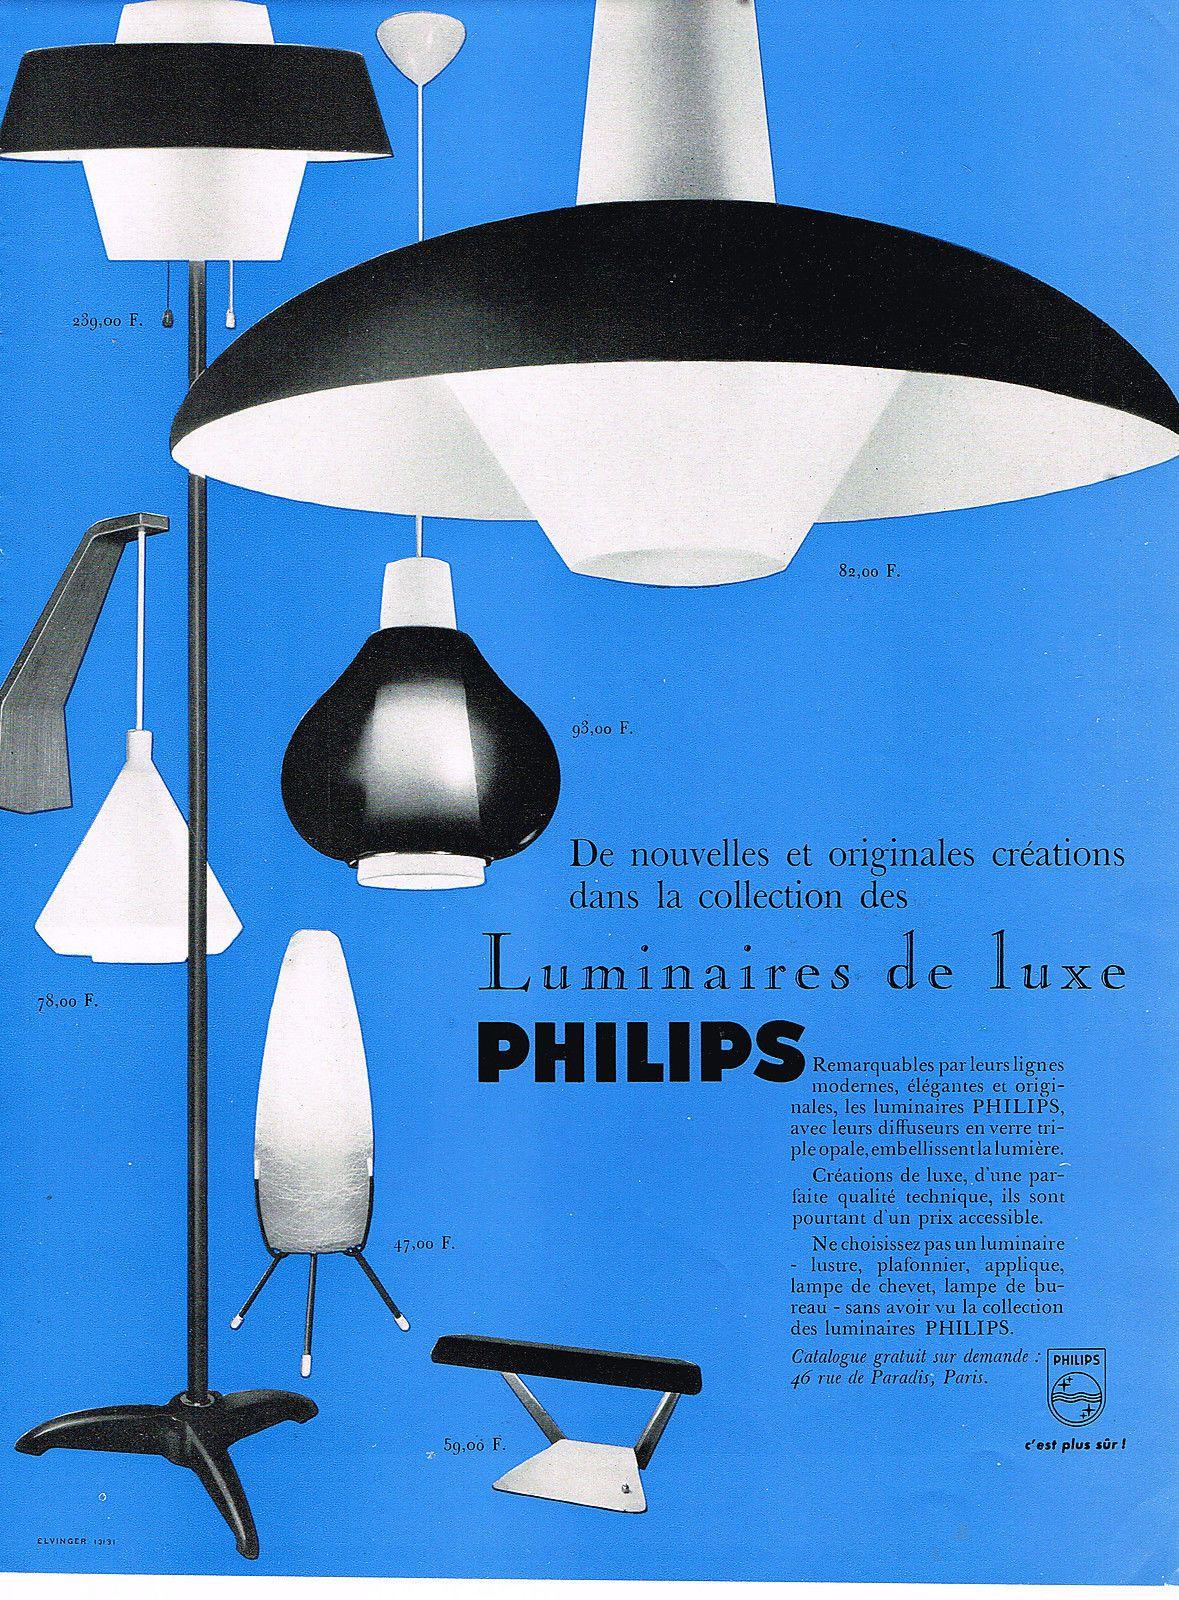 Advertising advertising 1964 philips lighting luminaires ebay advertising advertising 1964 philips lighting luminaires ebay philips60 scookingadvertisinglight fittingskochen arubaitofo Choice Image